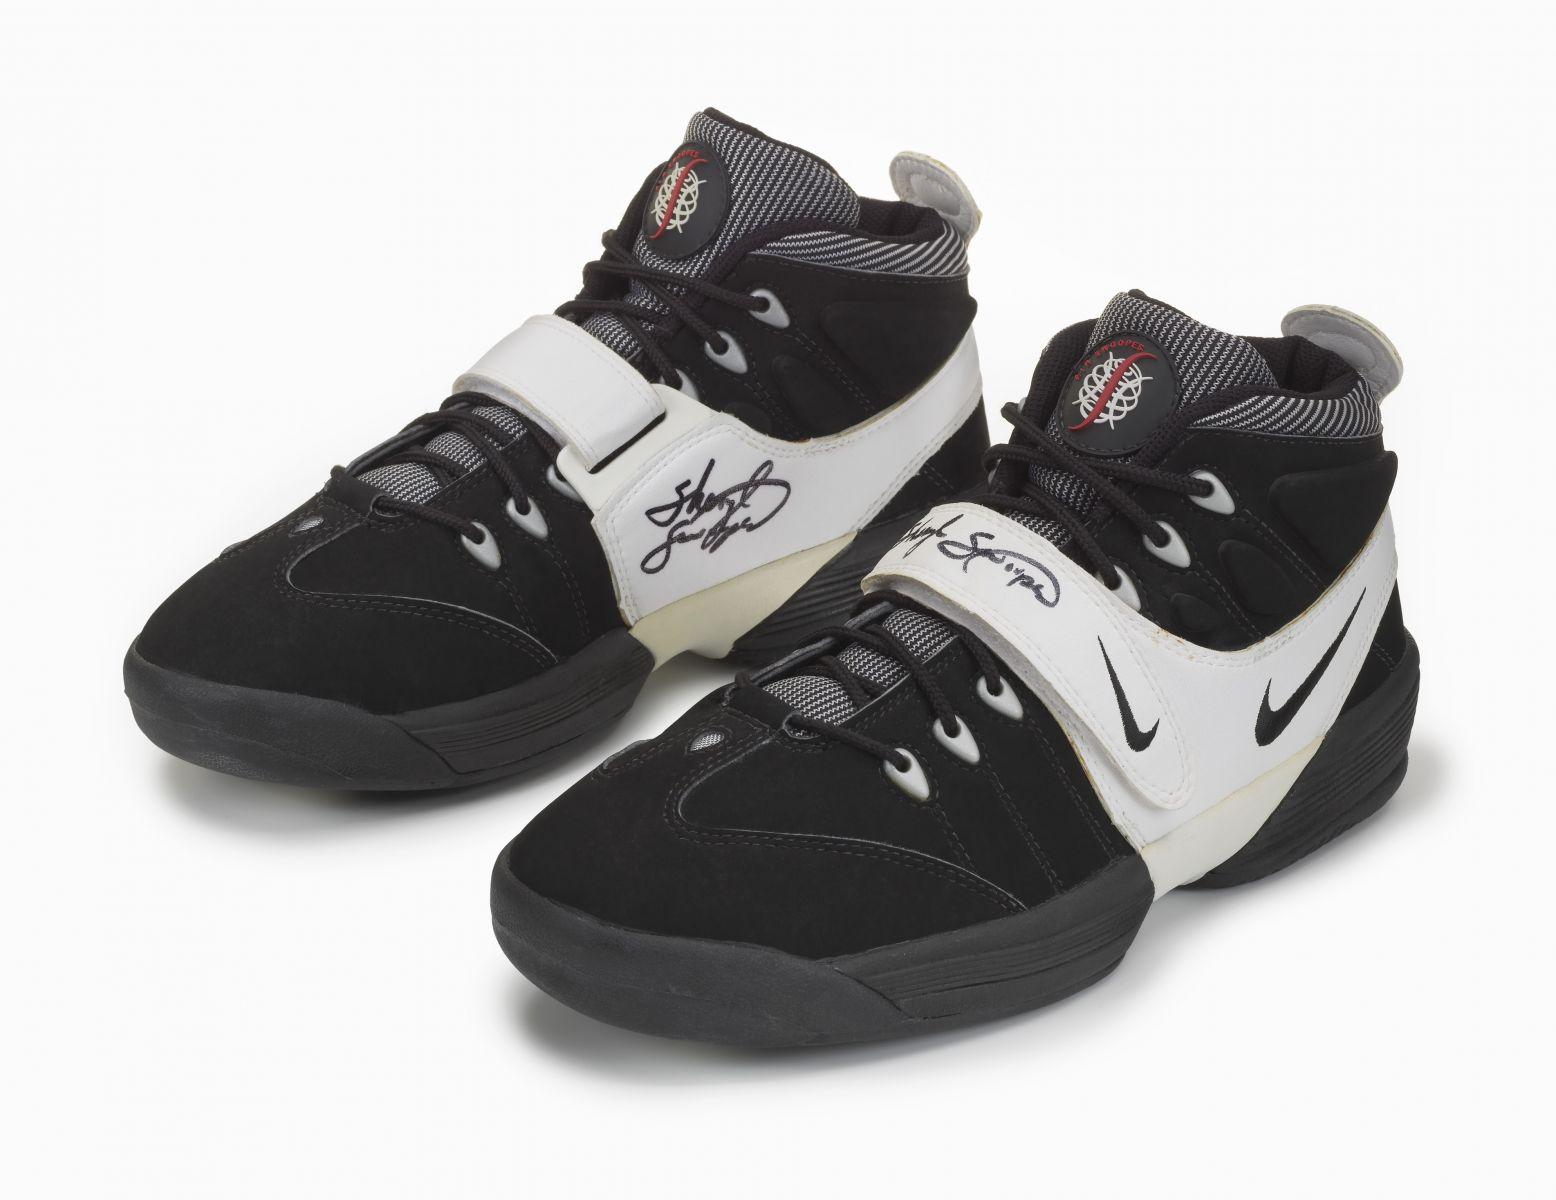 Sheryl Swoopes Nike Signature Sneakers